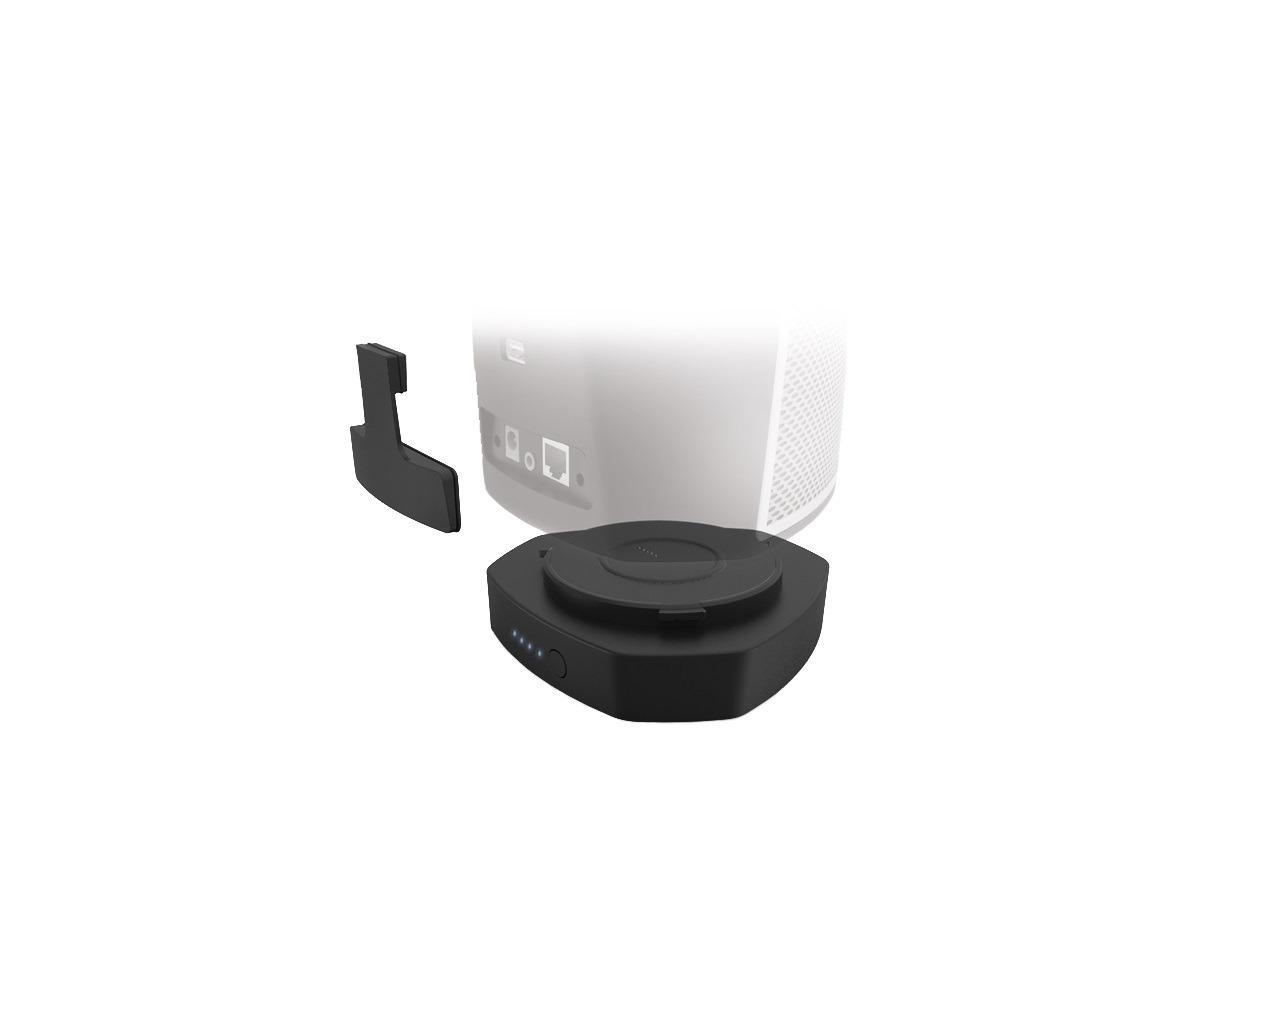 Denon audio accessoire HEOS 1 GO PACK HS2 zwart